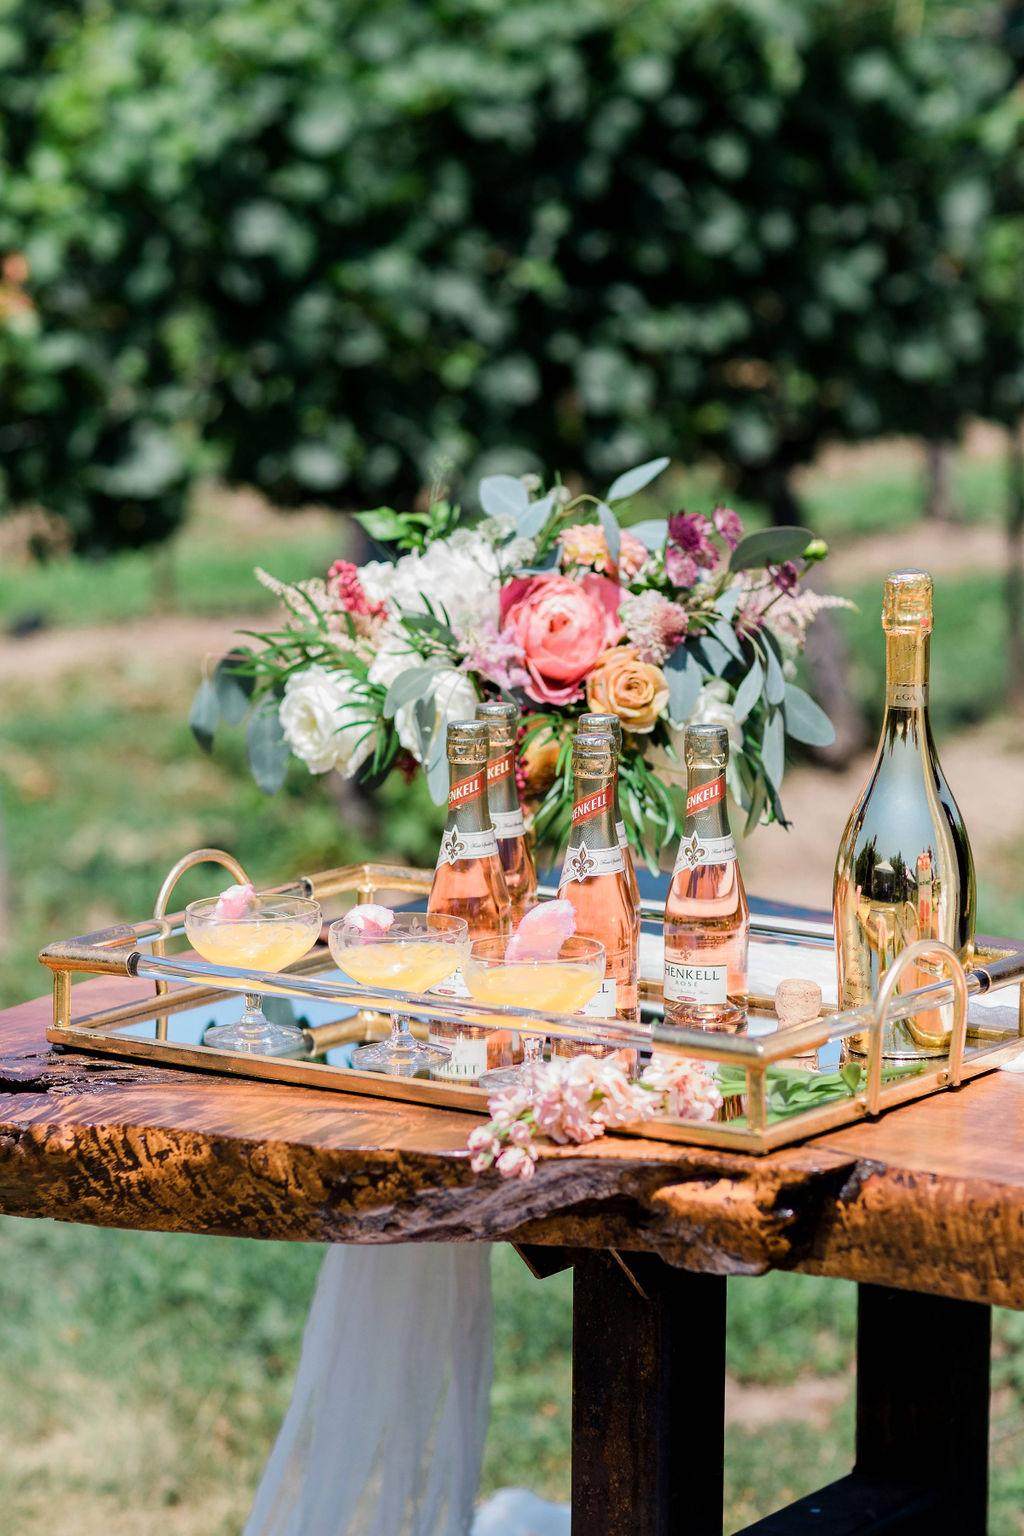 Kurtz-Orchards-Niagara-on-the-Lake-Styled-Wedding-Session-Shotlife-Studio-Calderone-Co-Luxury-Events-Vineyard-Bride-25.JPG